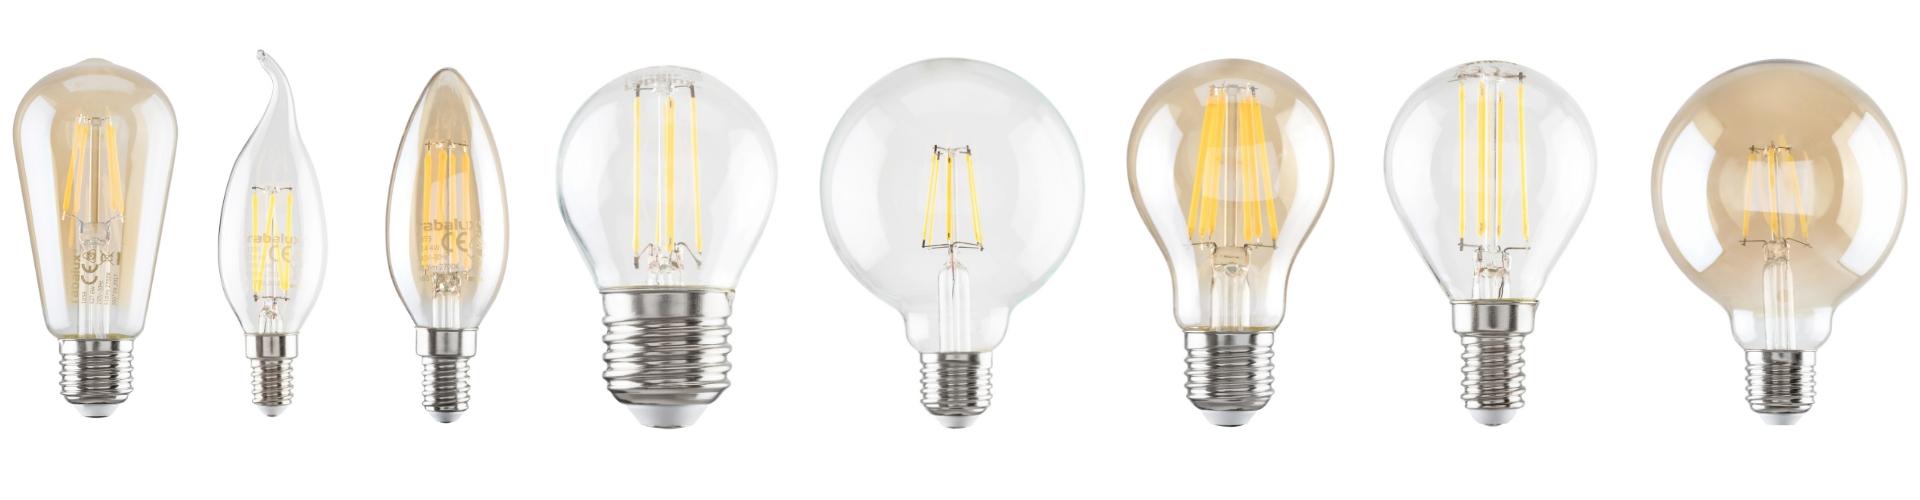 LED filament žarulje